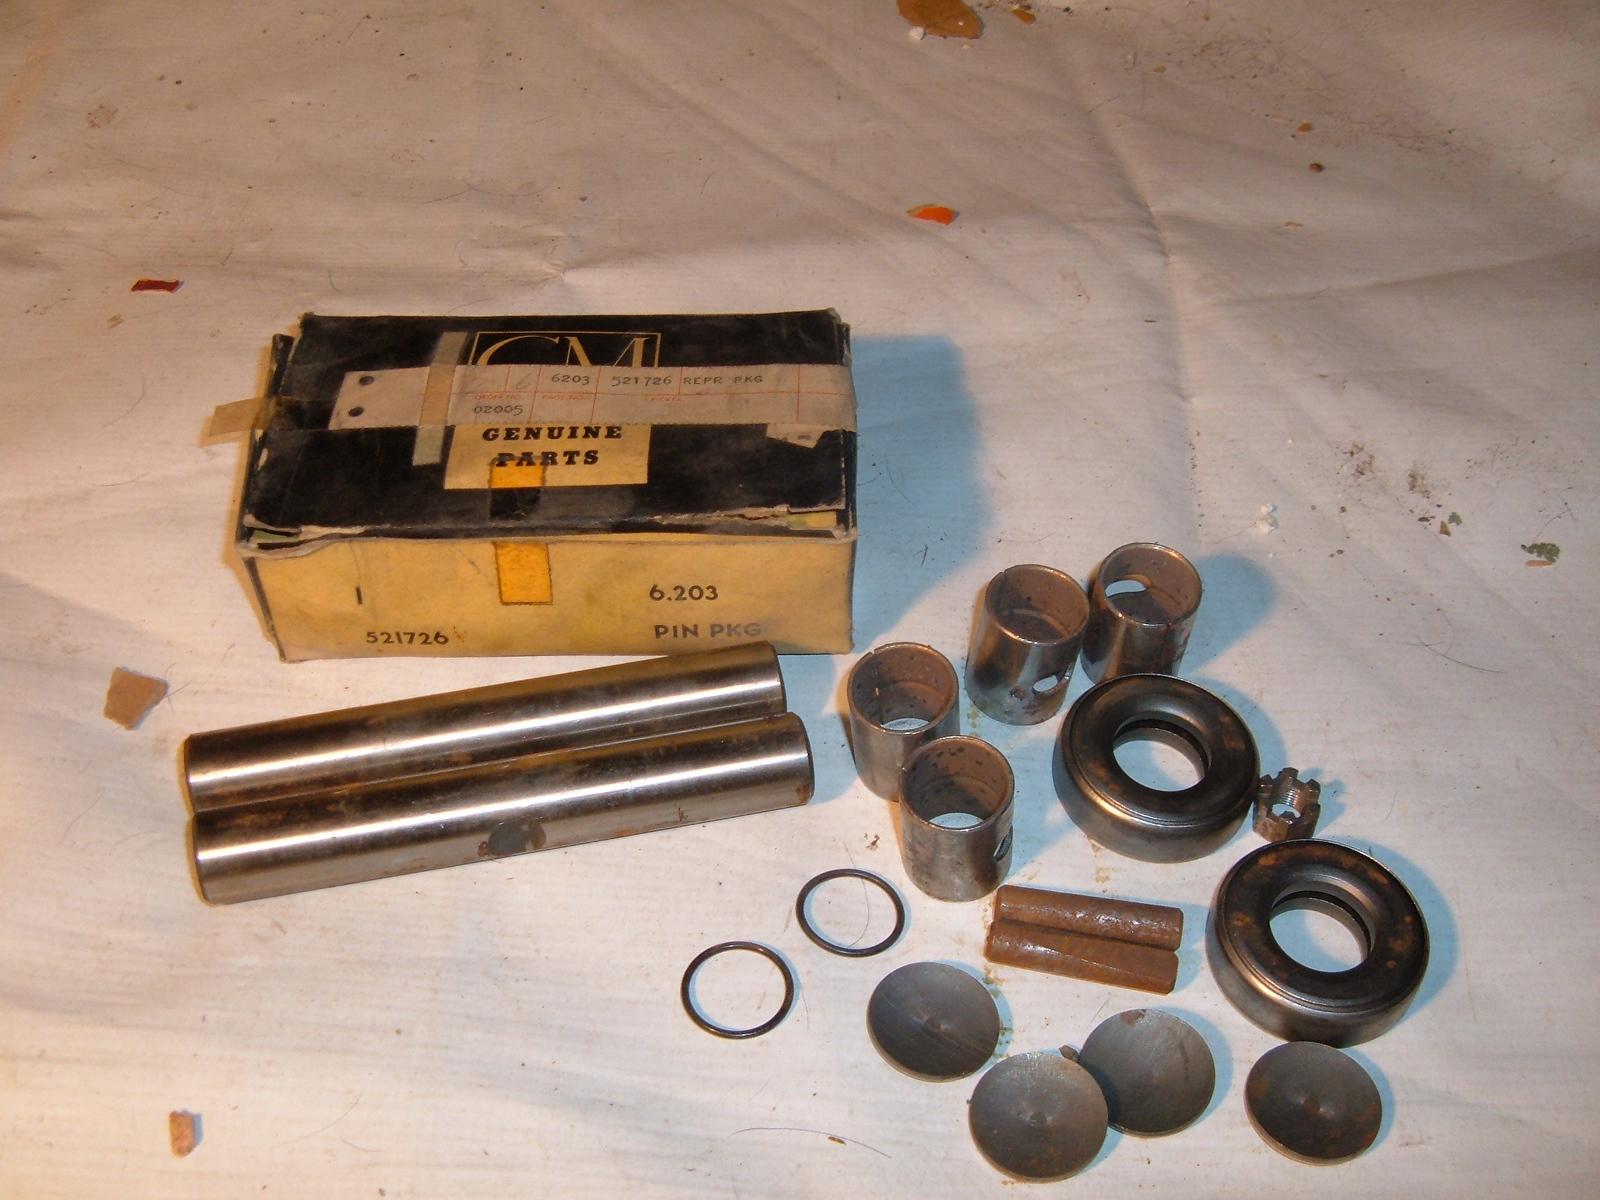 View Product1956 1957 pontiac king pin set nos gm 521726 (z 521726)